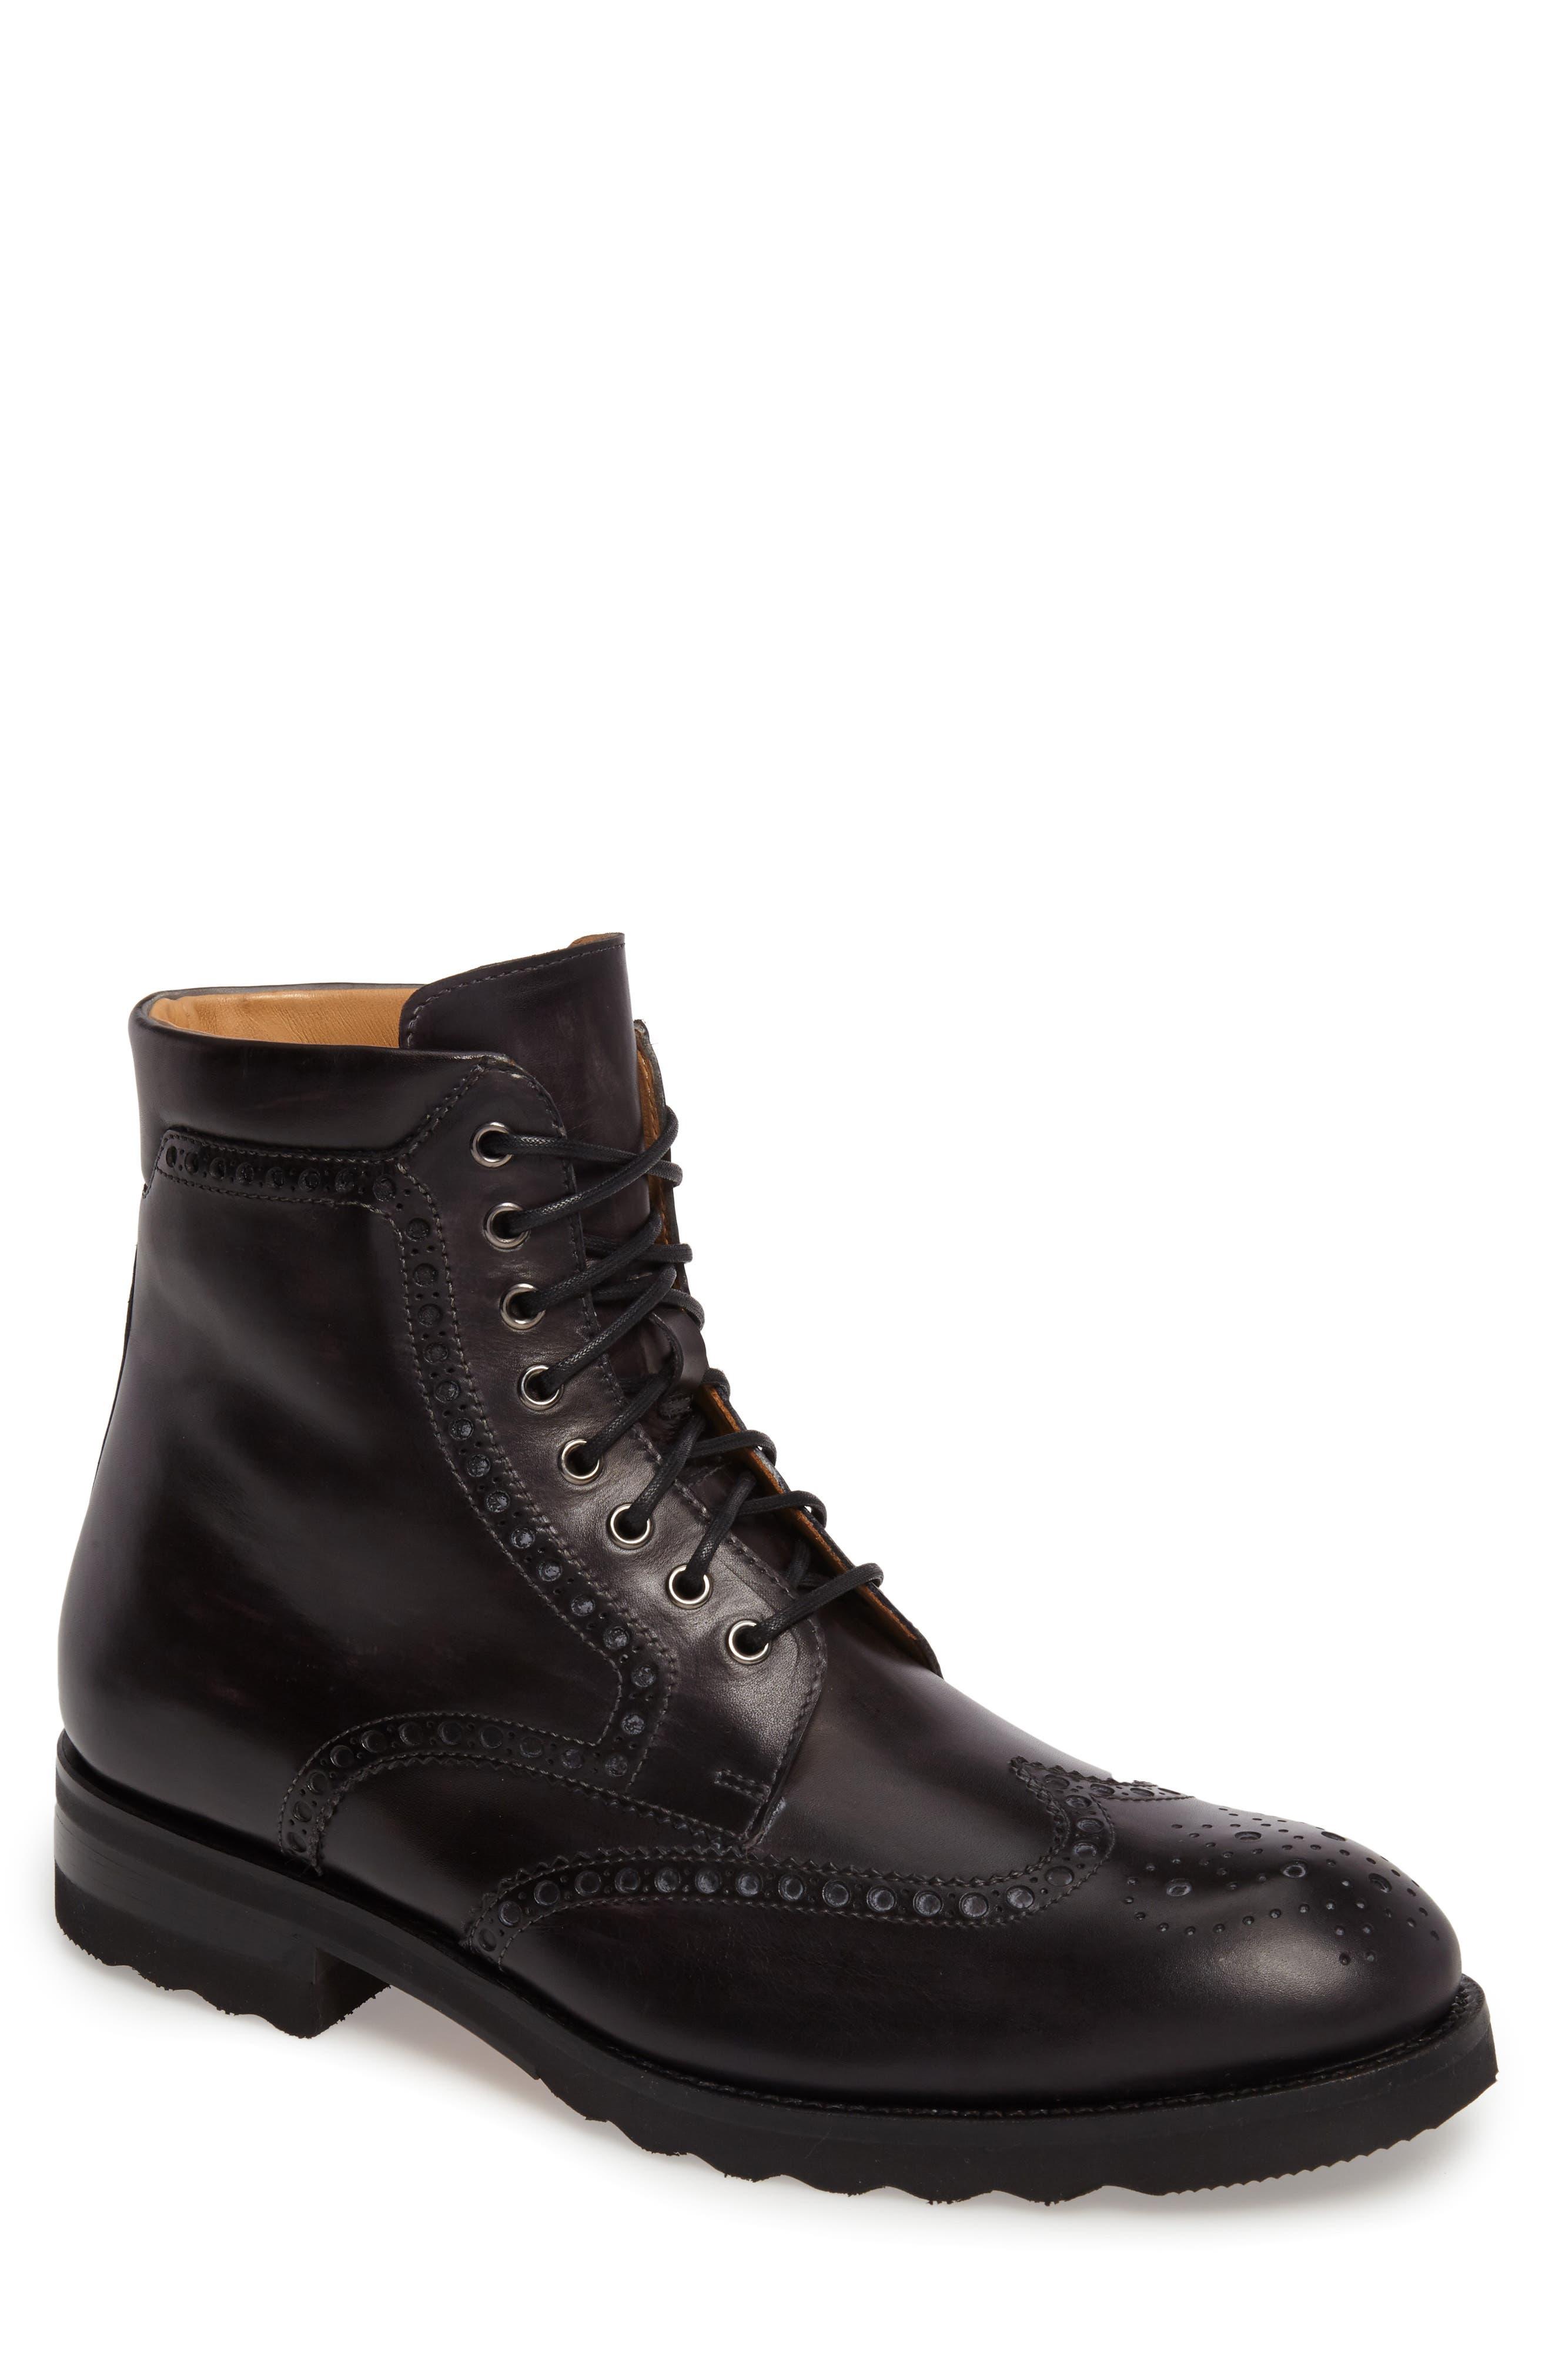 Magnanni Fairfax Wingtip Boot, Grey